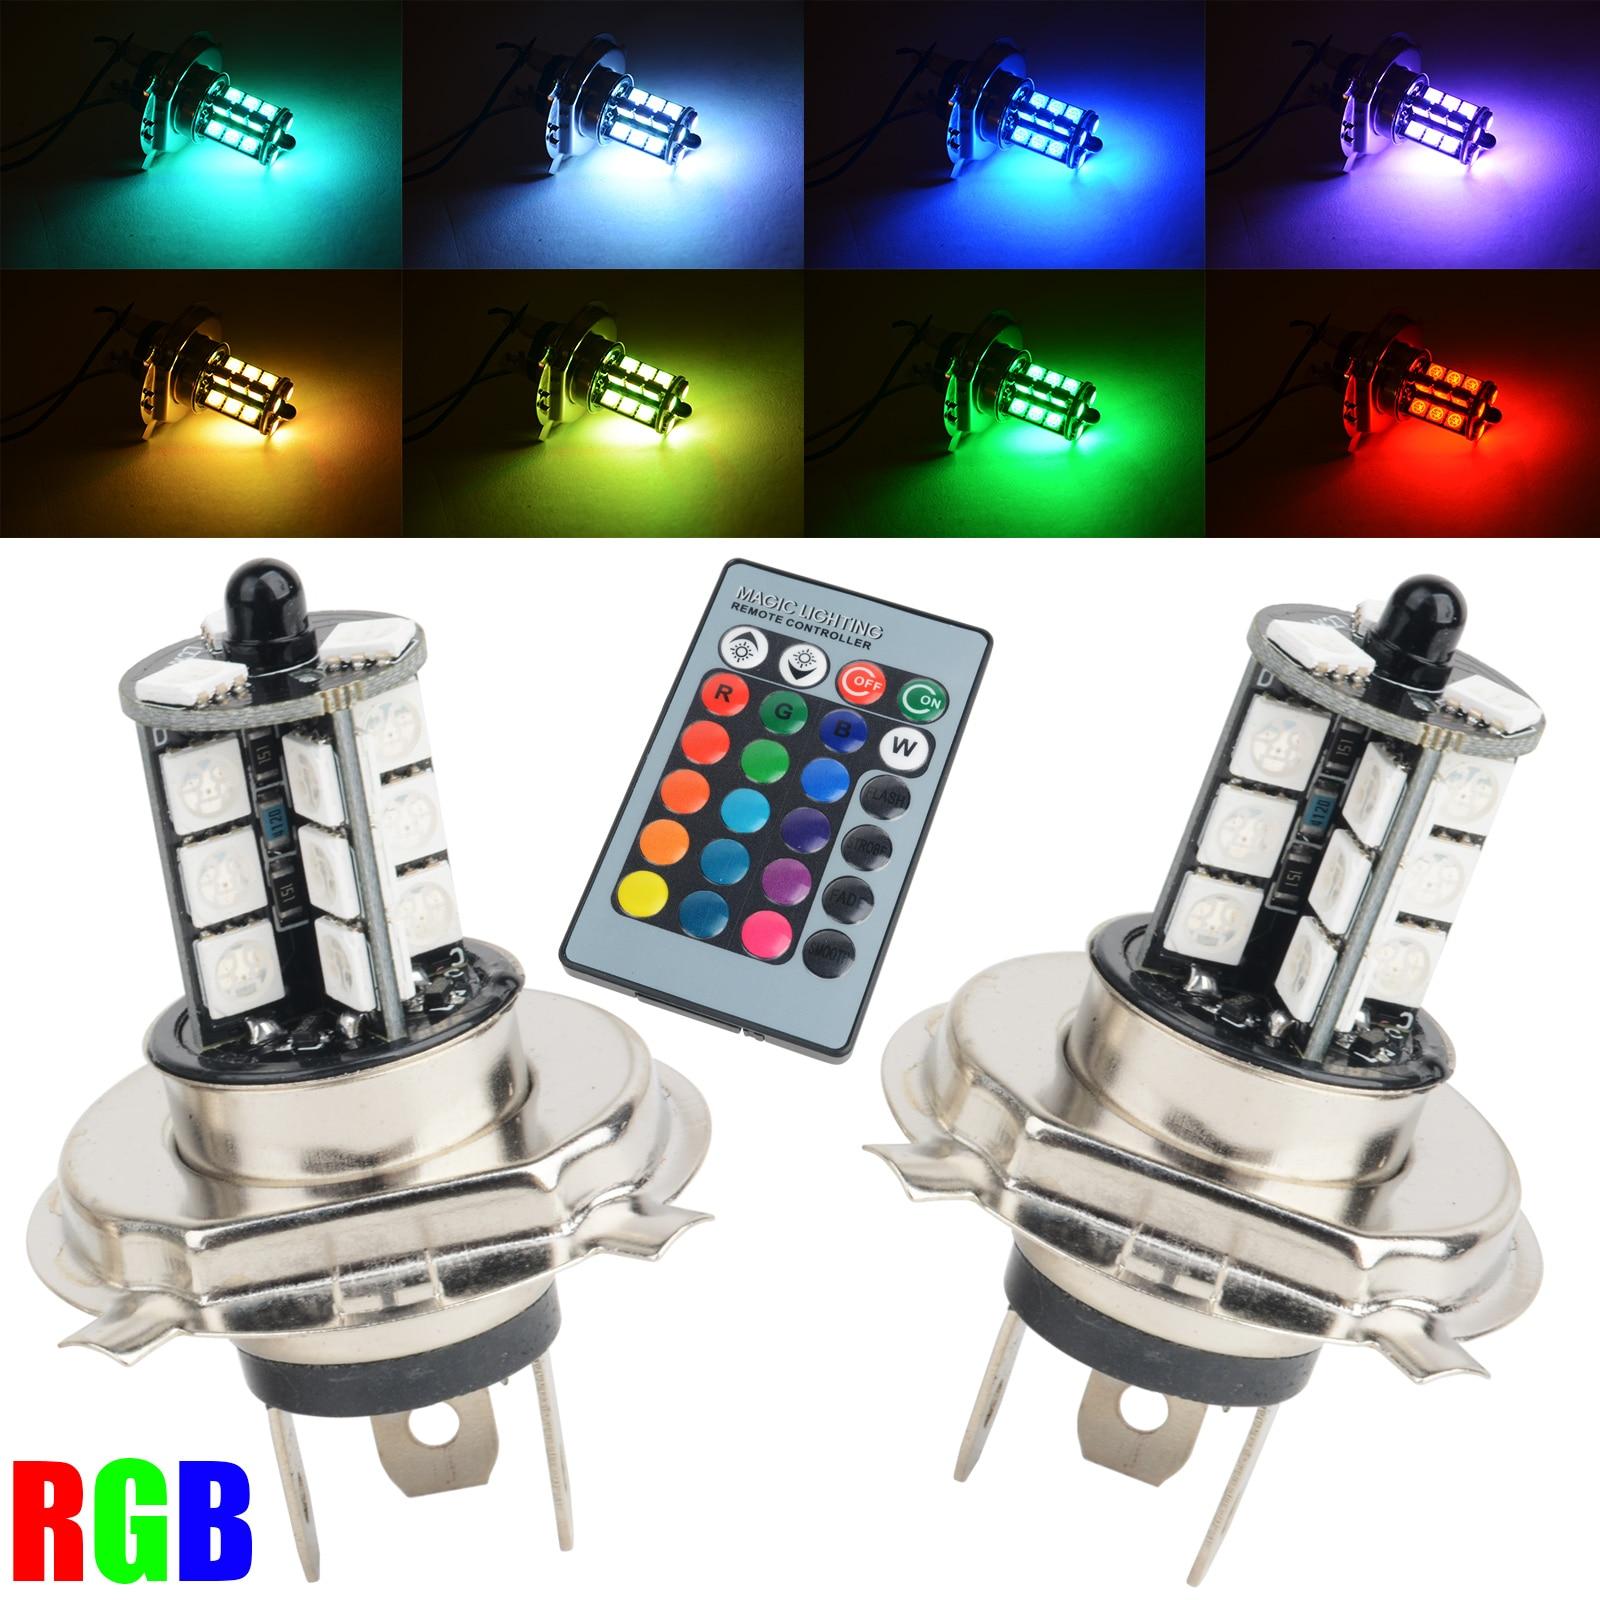 2pcs RGB Wireless Control H4 5050 27LED Decoration DRL Fog Light Bulbs+Remote